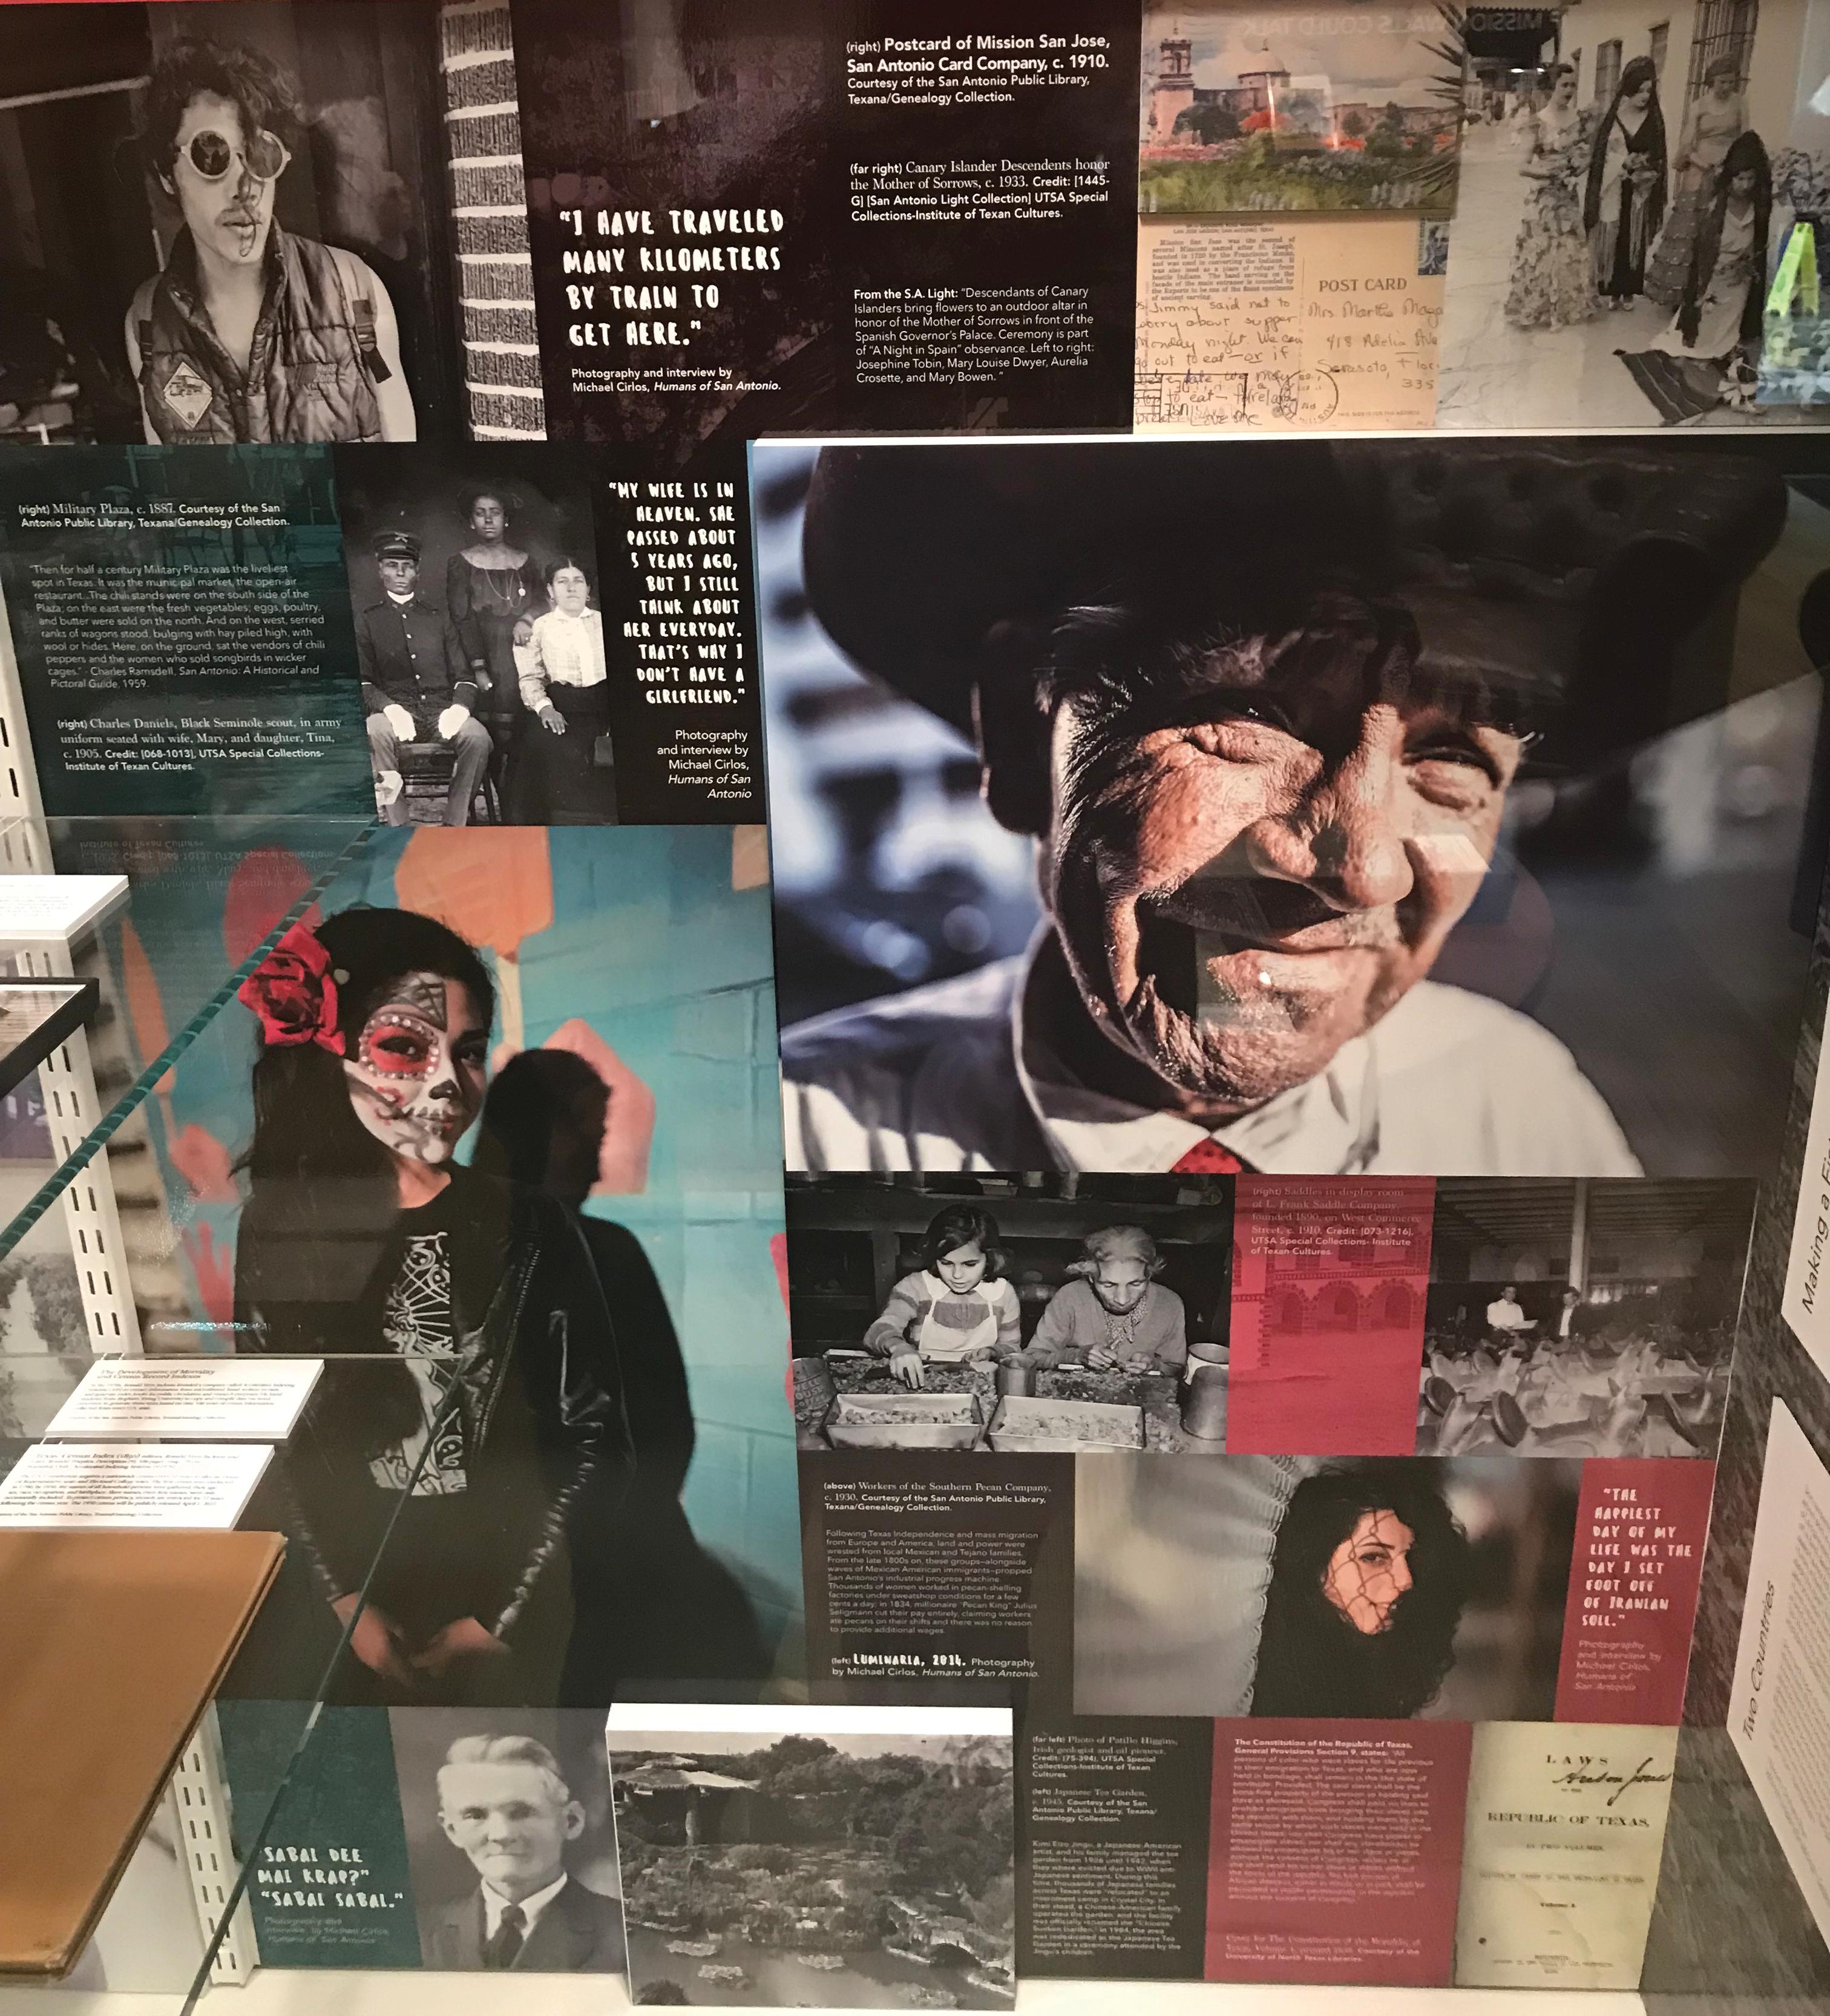 Generations of San Antonio citizens are honored at the DreamWeek exhibit. Photo courtesy Alfonzo Mendoza